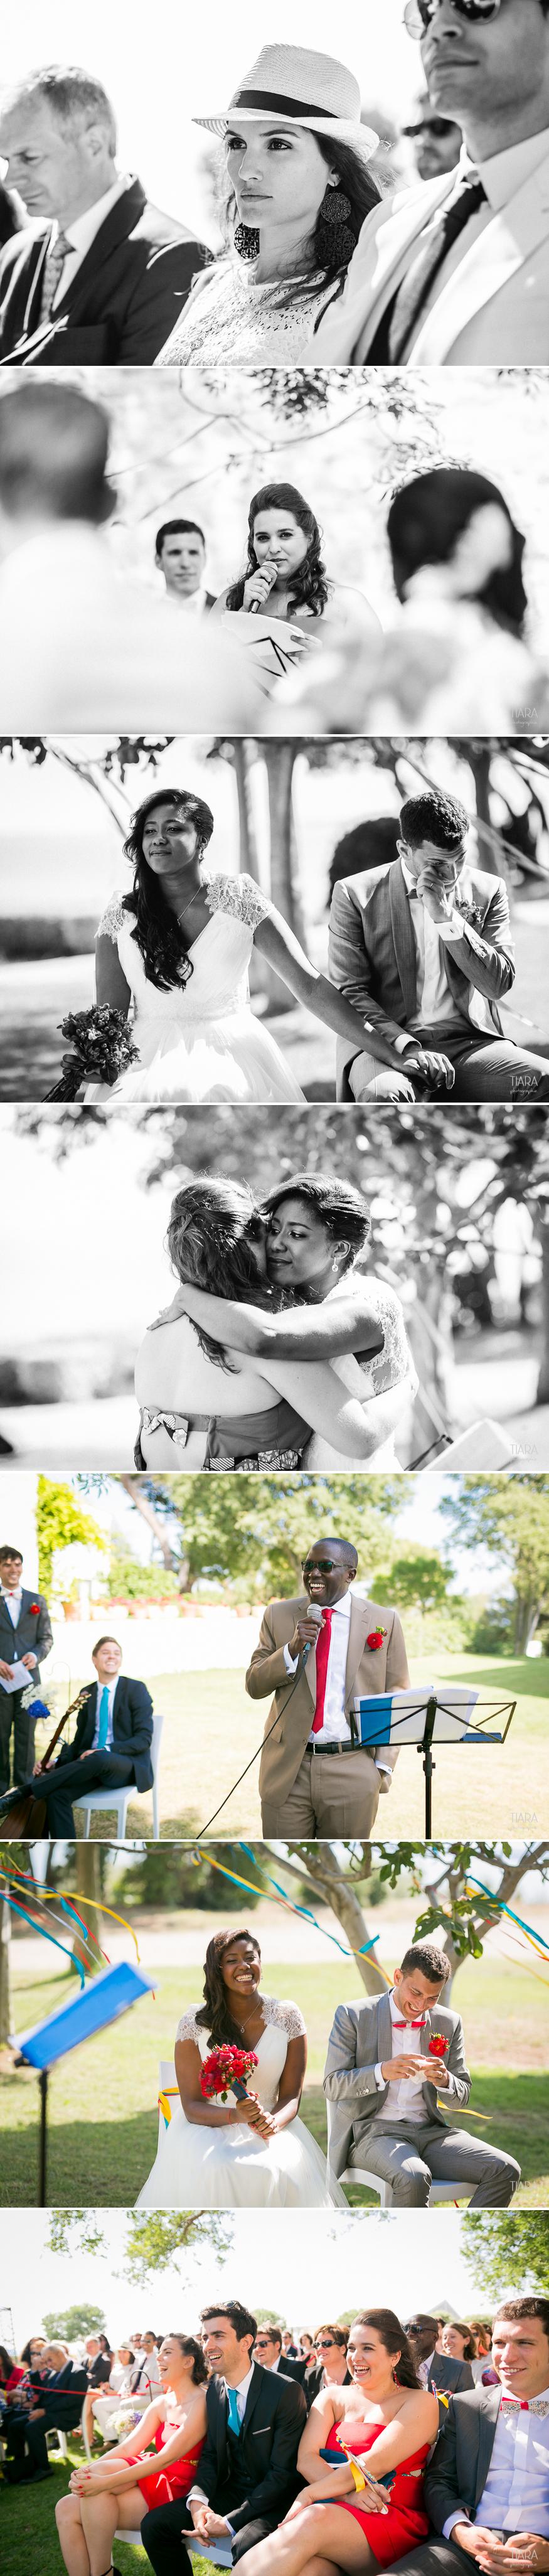 photographe mariage montpellier - copie